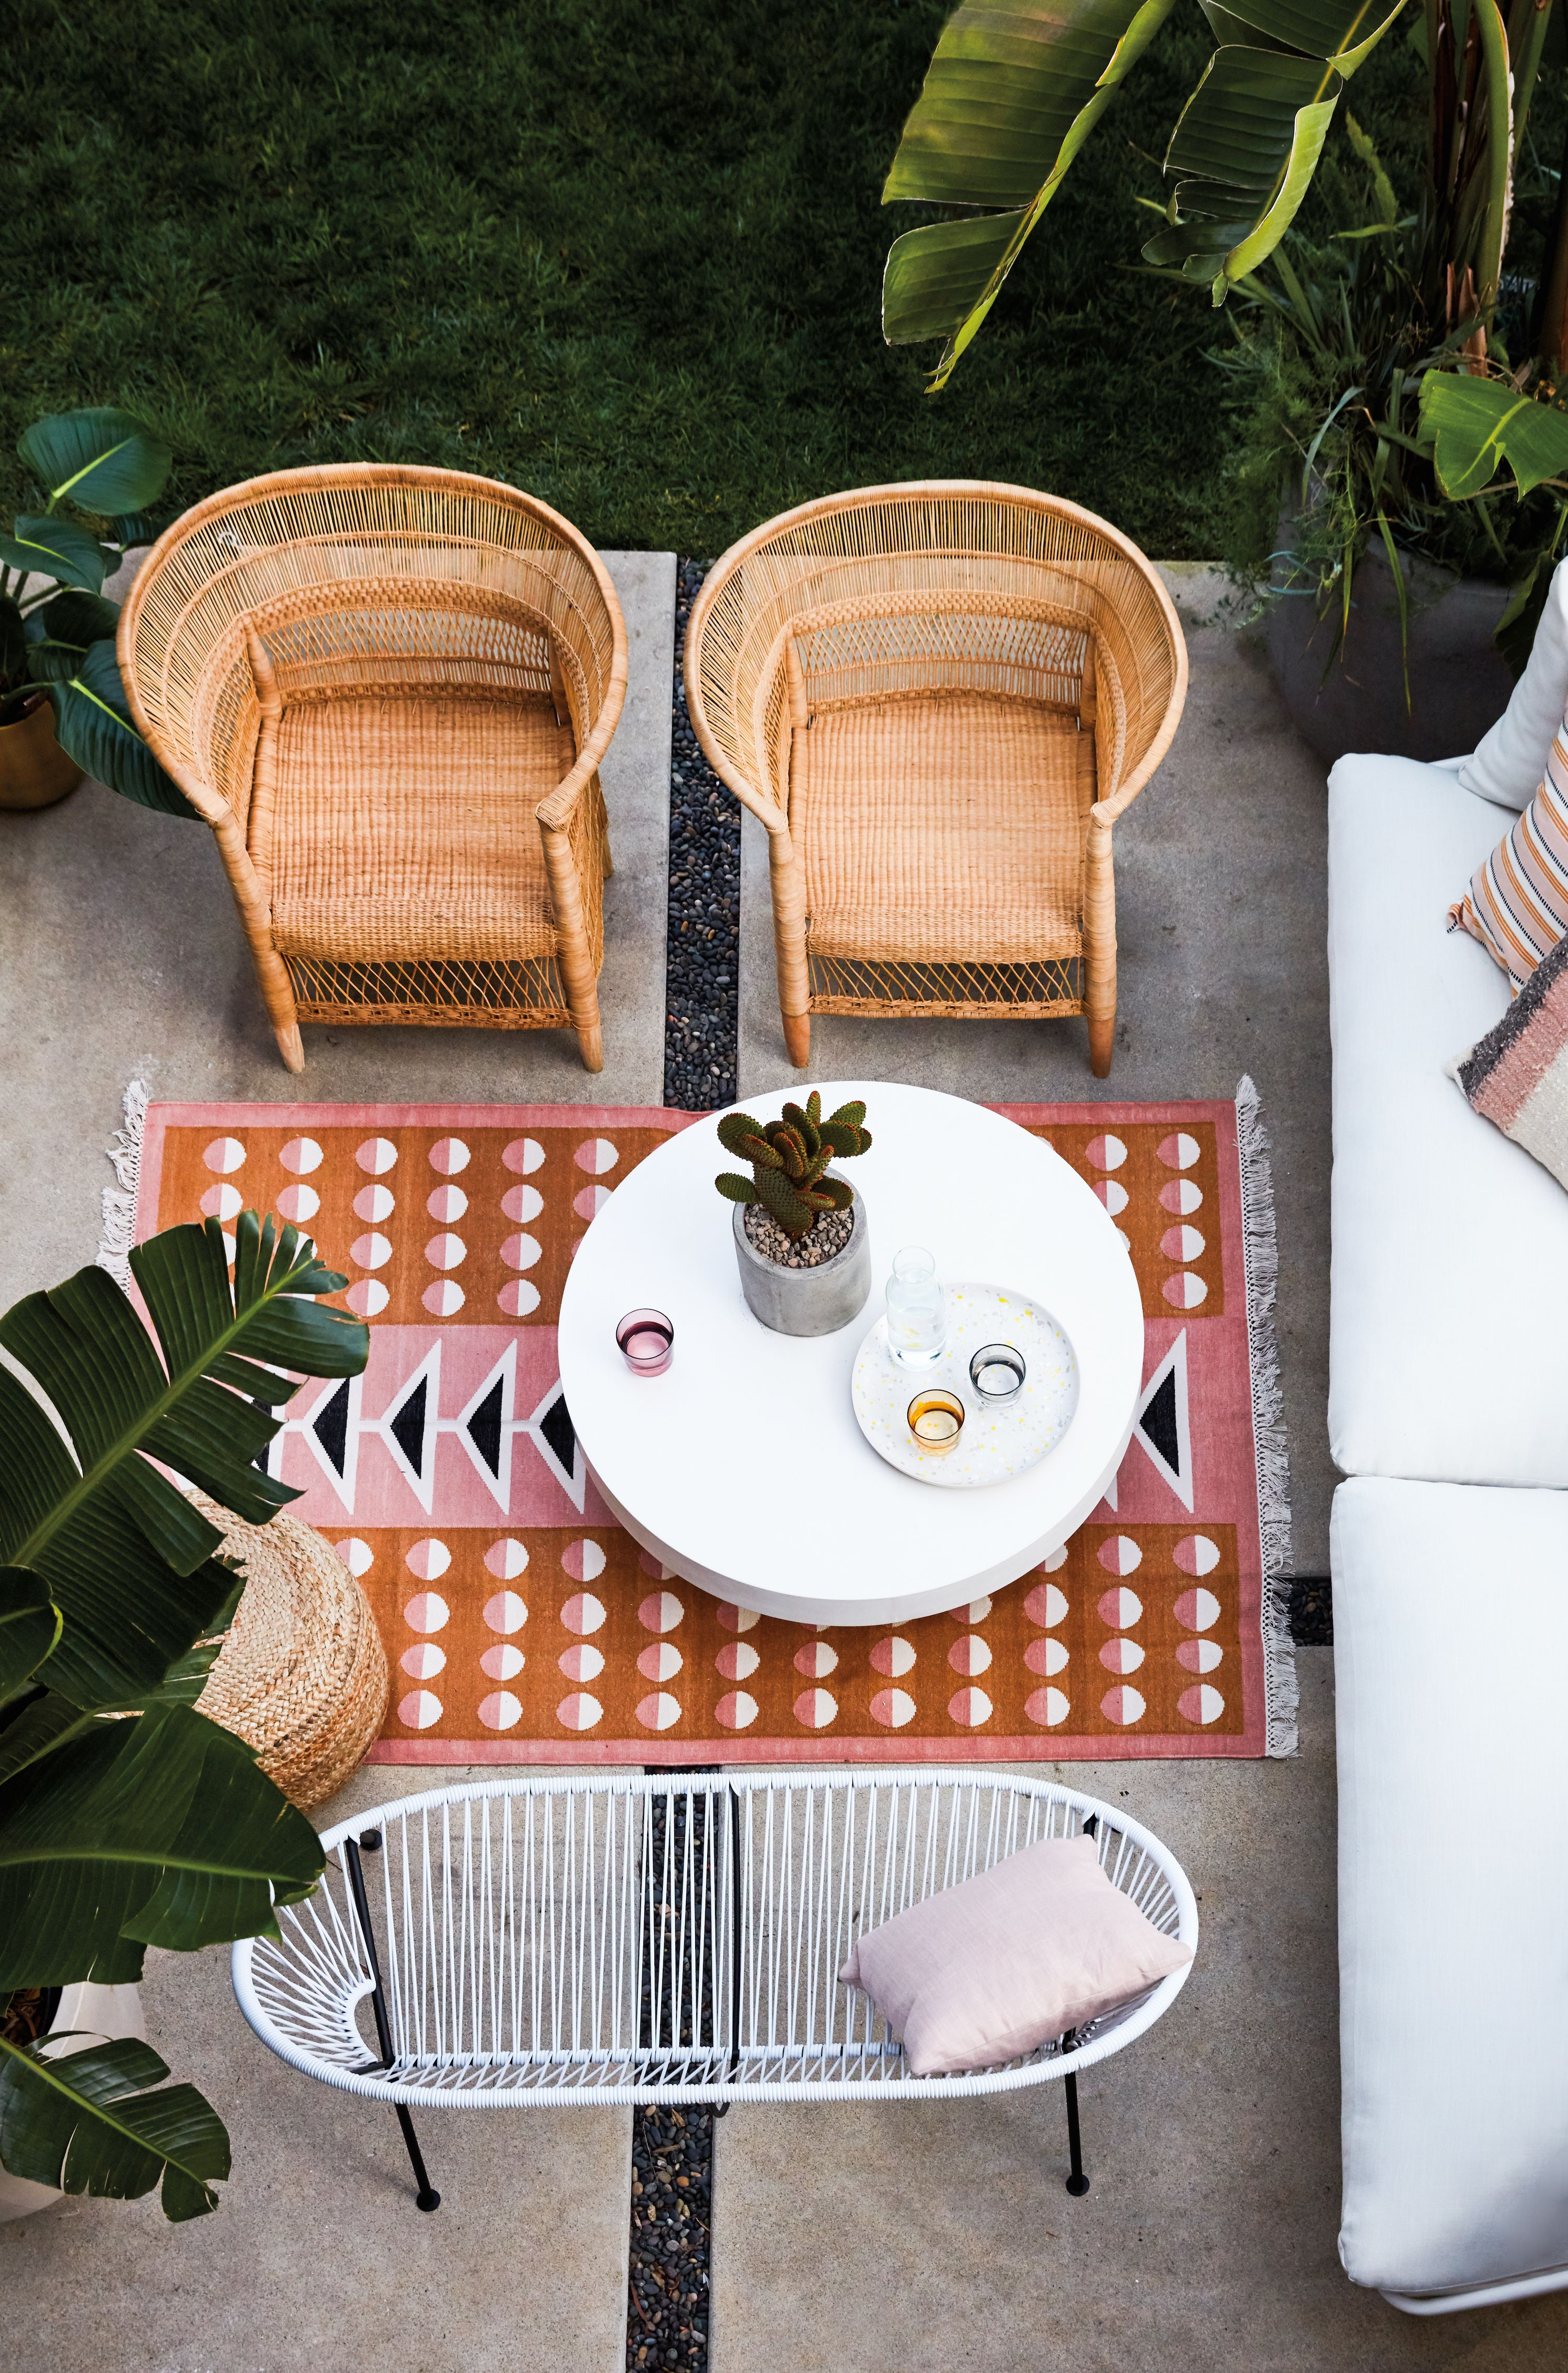 Garance Dore Modern Los Angeles Home Tour Patio Inspiration Bohemian Patio Decor